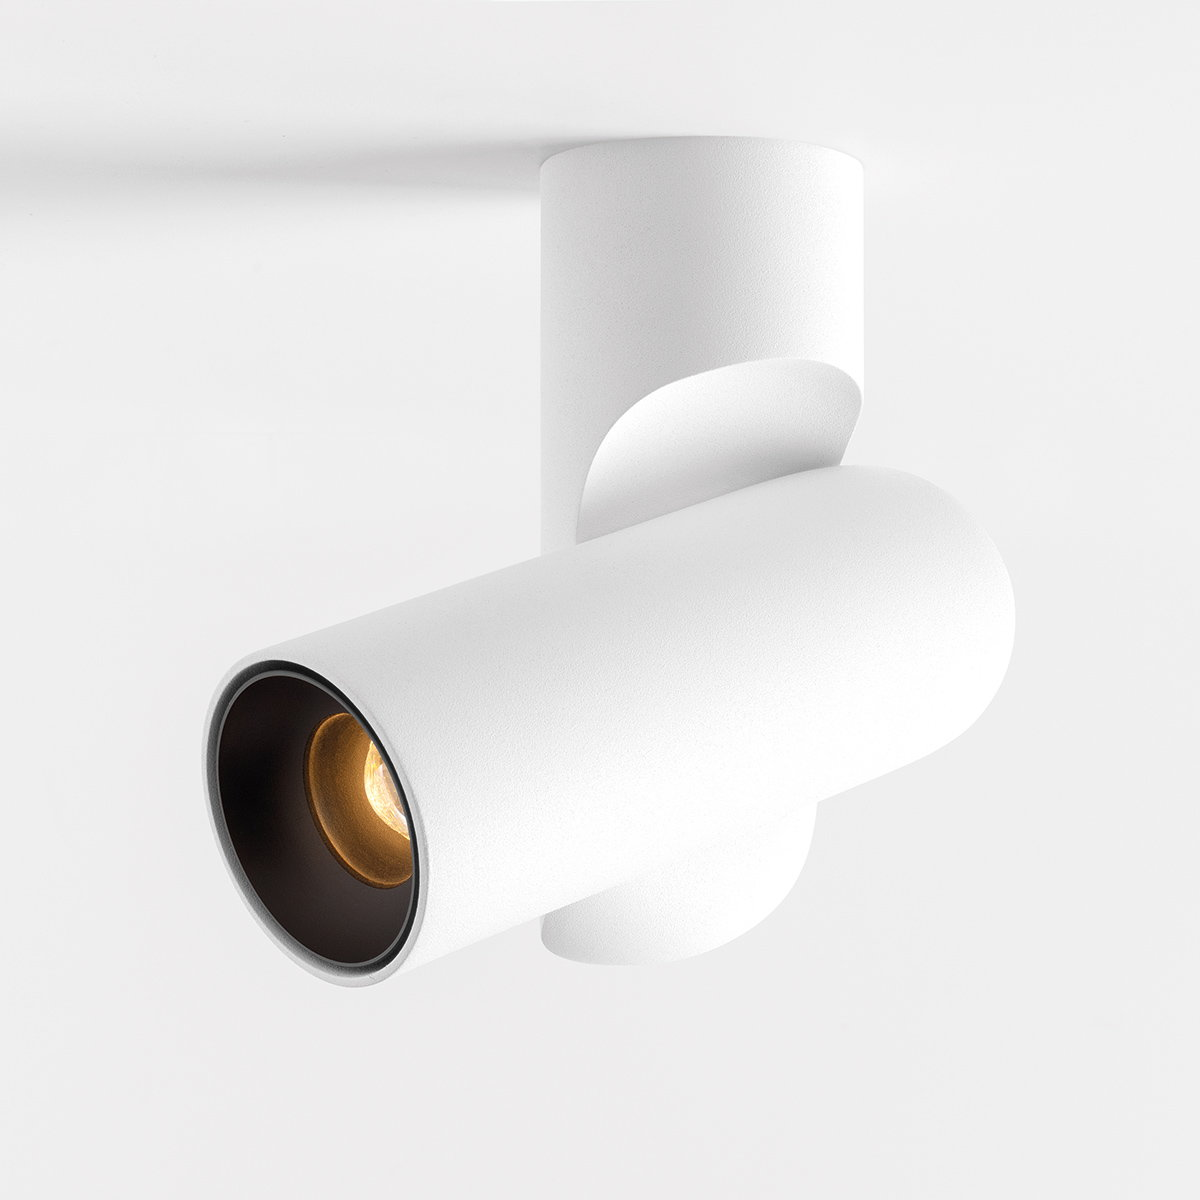 Modular Lighting Instruments Launches